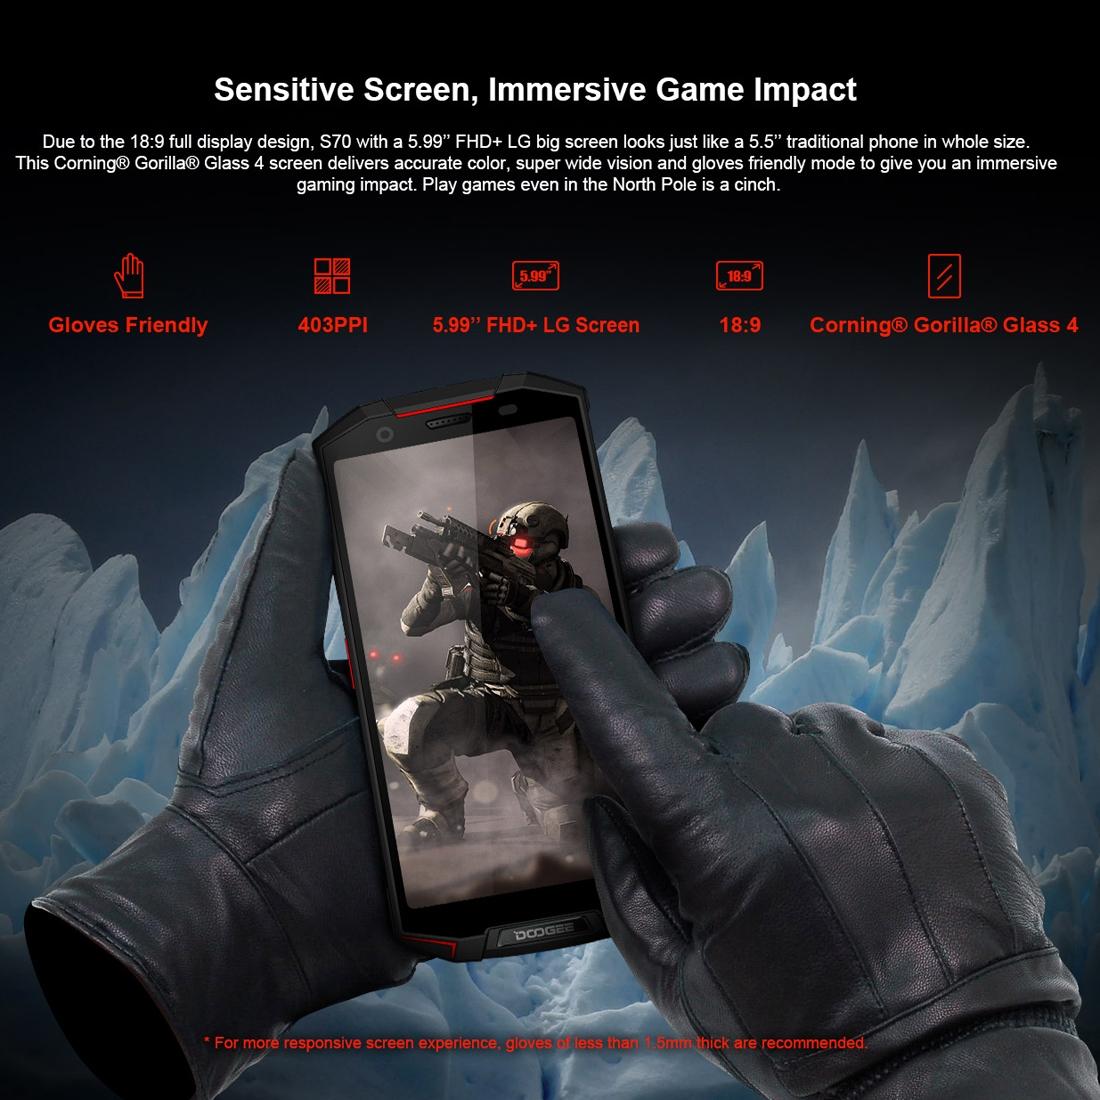 Проектор Смартфон DOOGEE S70 6GB+64GB Защита от влаги пыли ударов по стандарту IP68/IP69K MIL-STD-810G 5500мАч батарея Двойная камера (Фото 5)